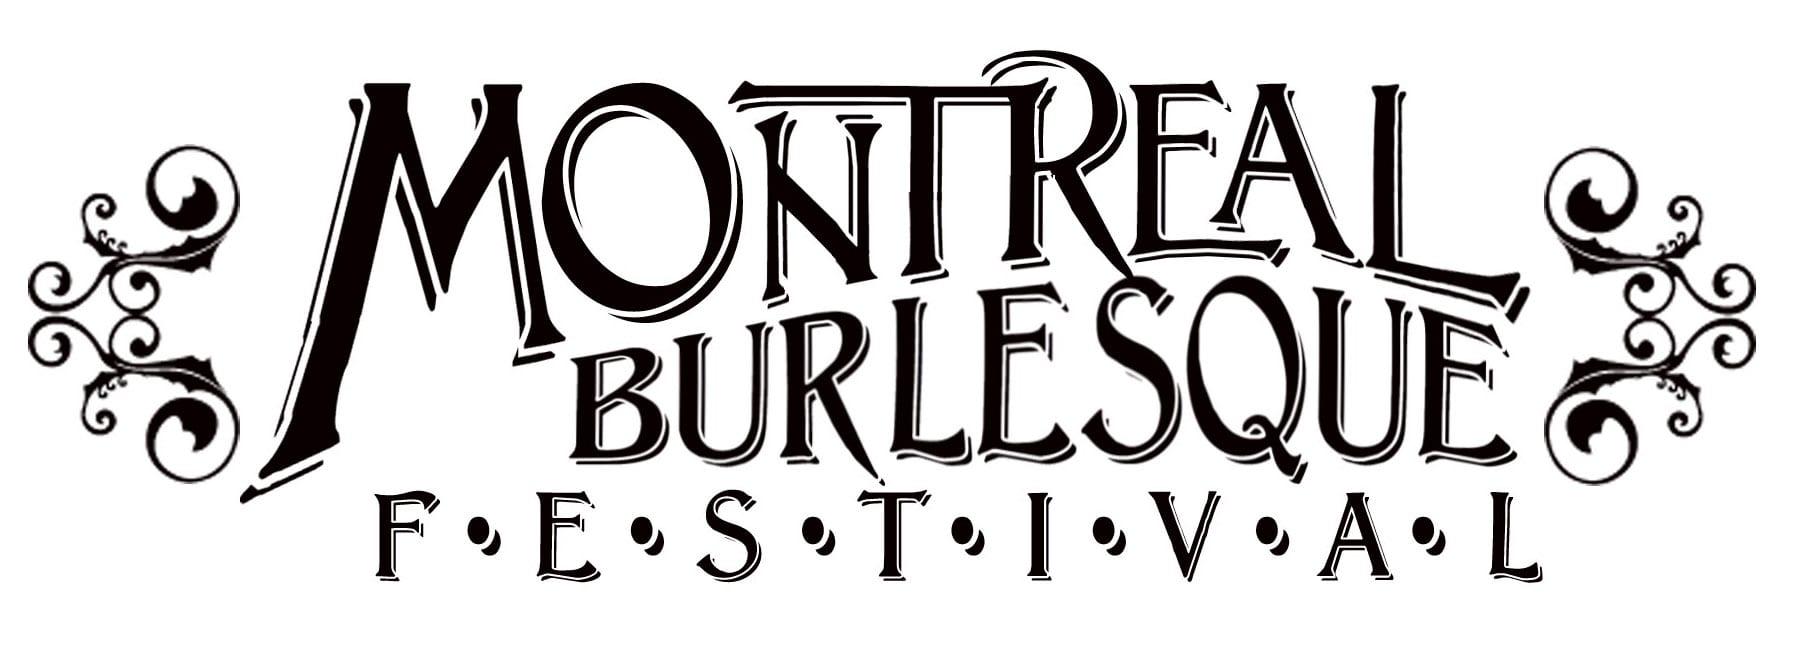 Montreal burlesque festival contact us